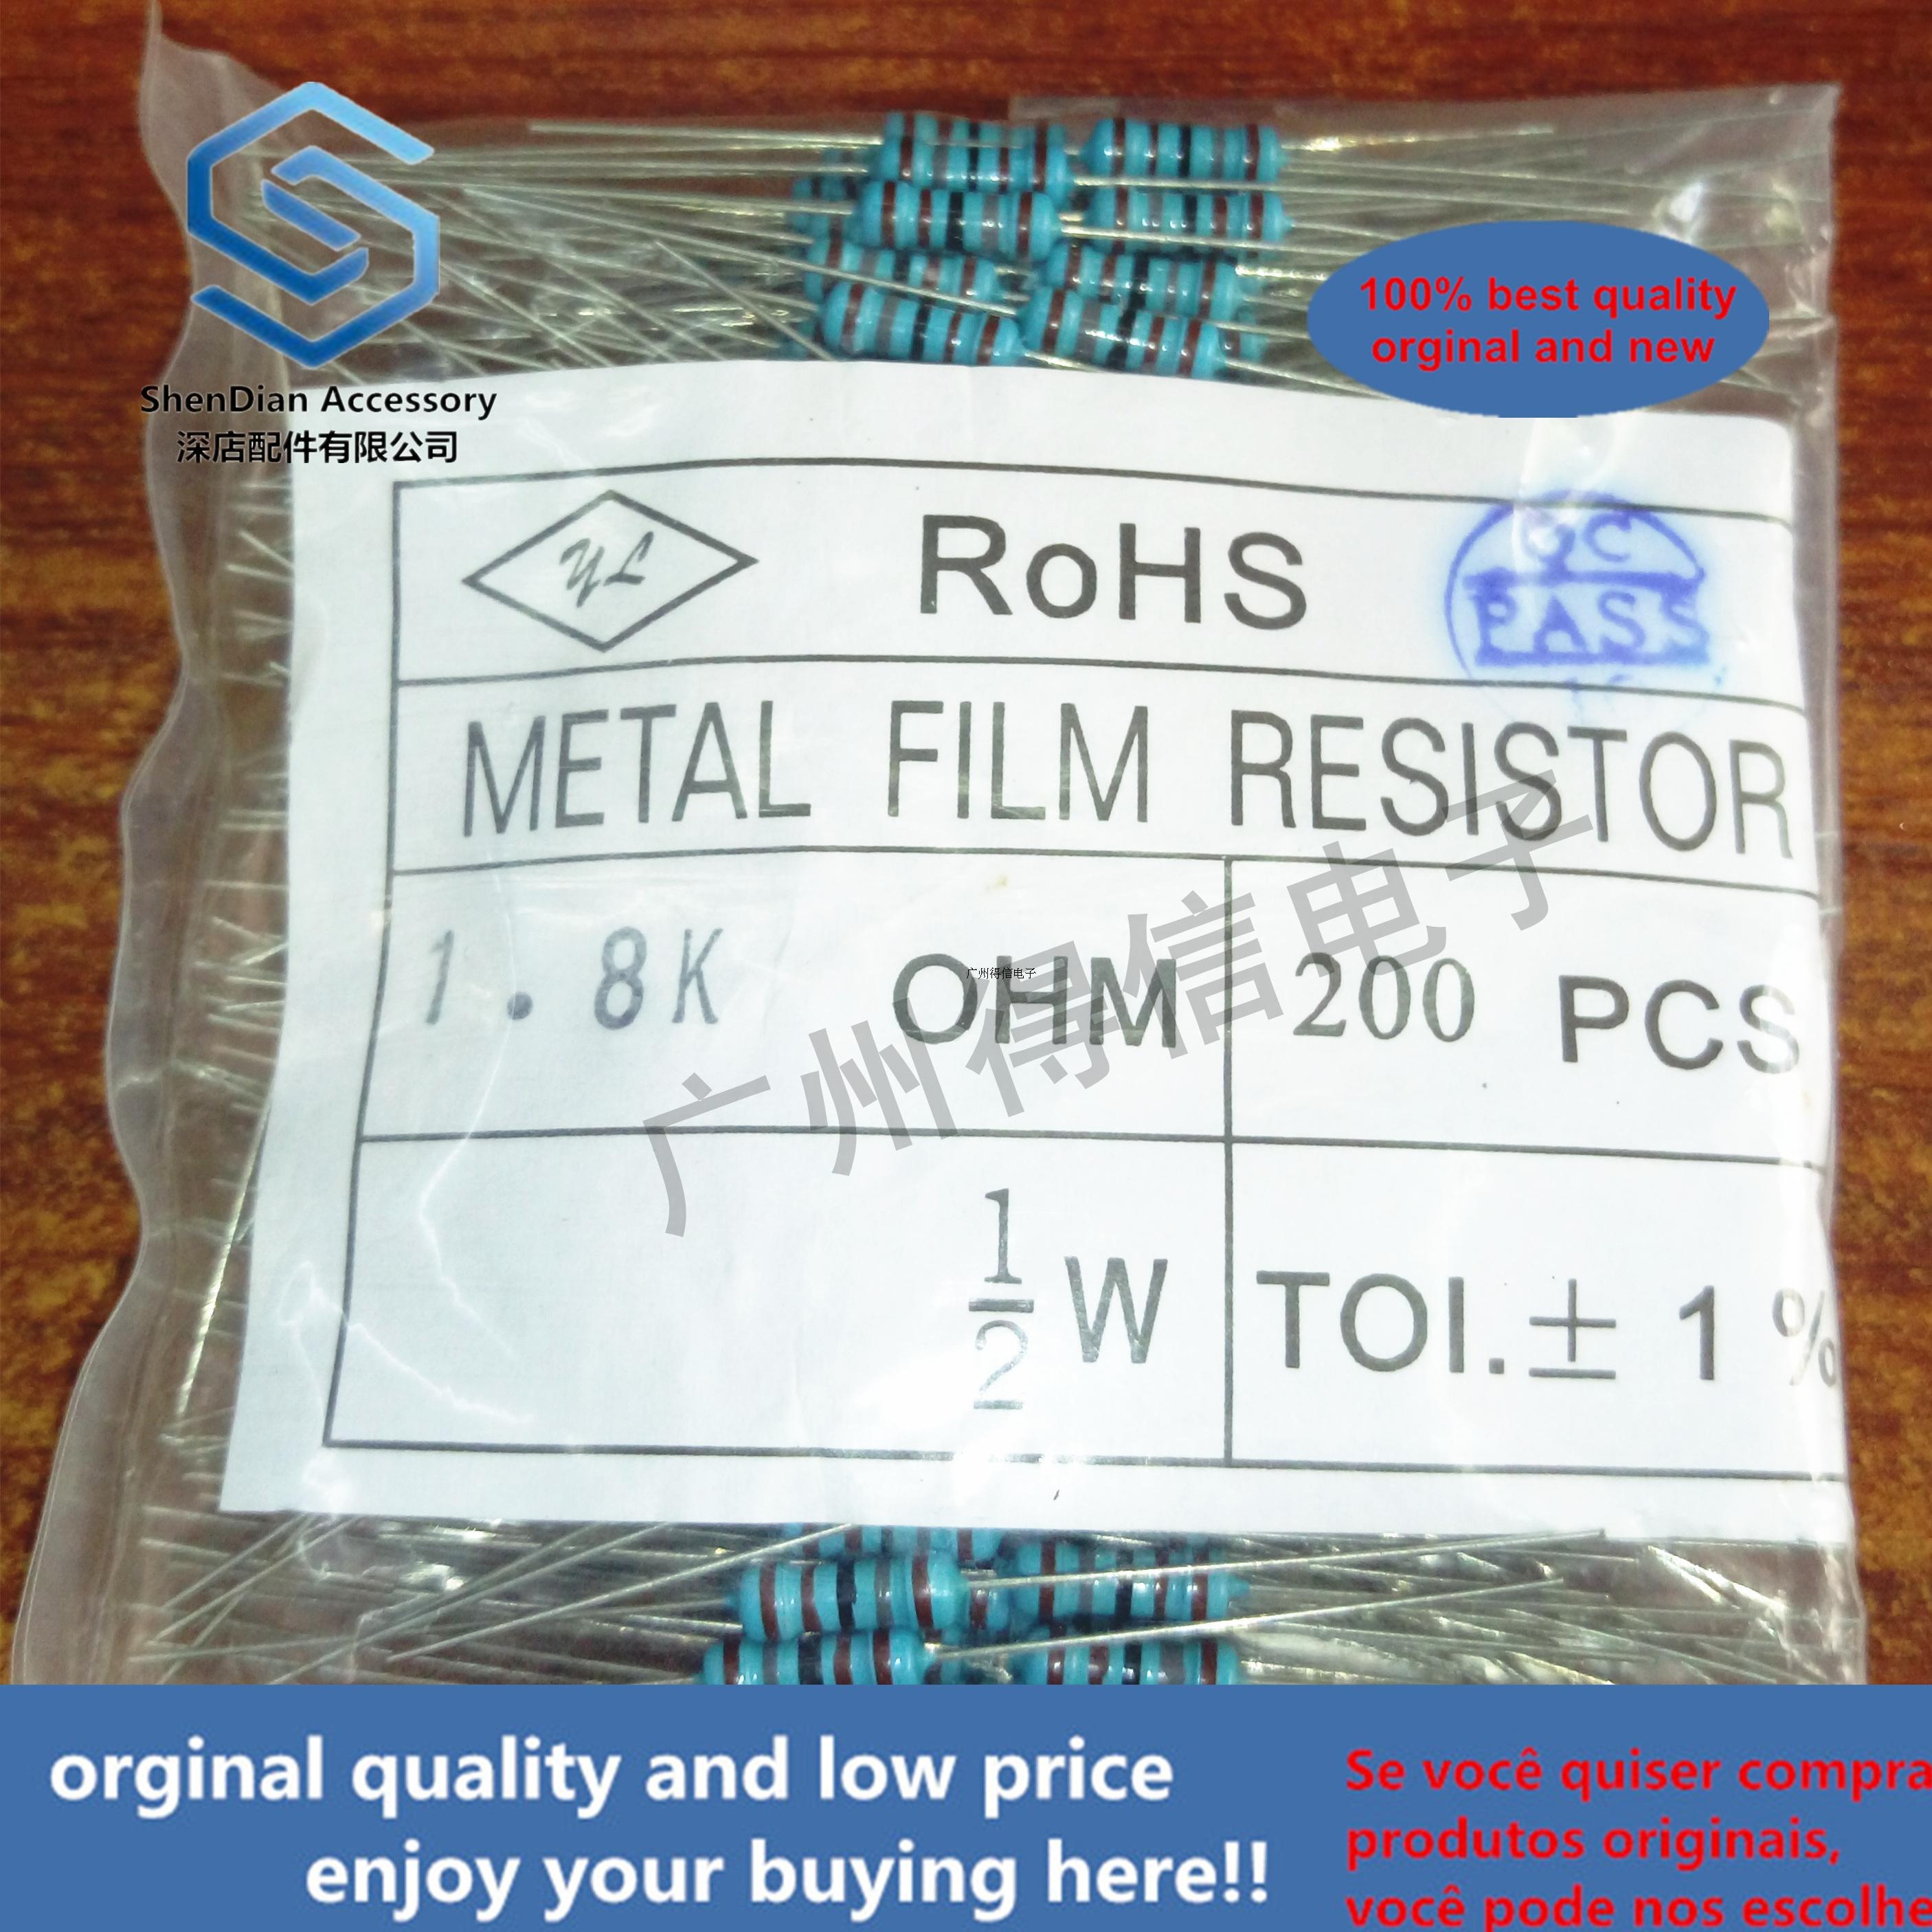 200pcs 1 / 2W 24K 24000 Euro 1% Brand New Metal Film Iron Feet Resistance Bag 200 Pcs Per Pack